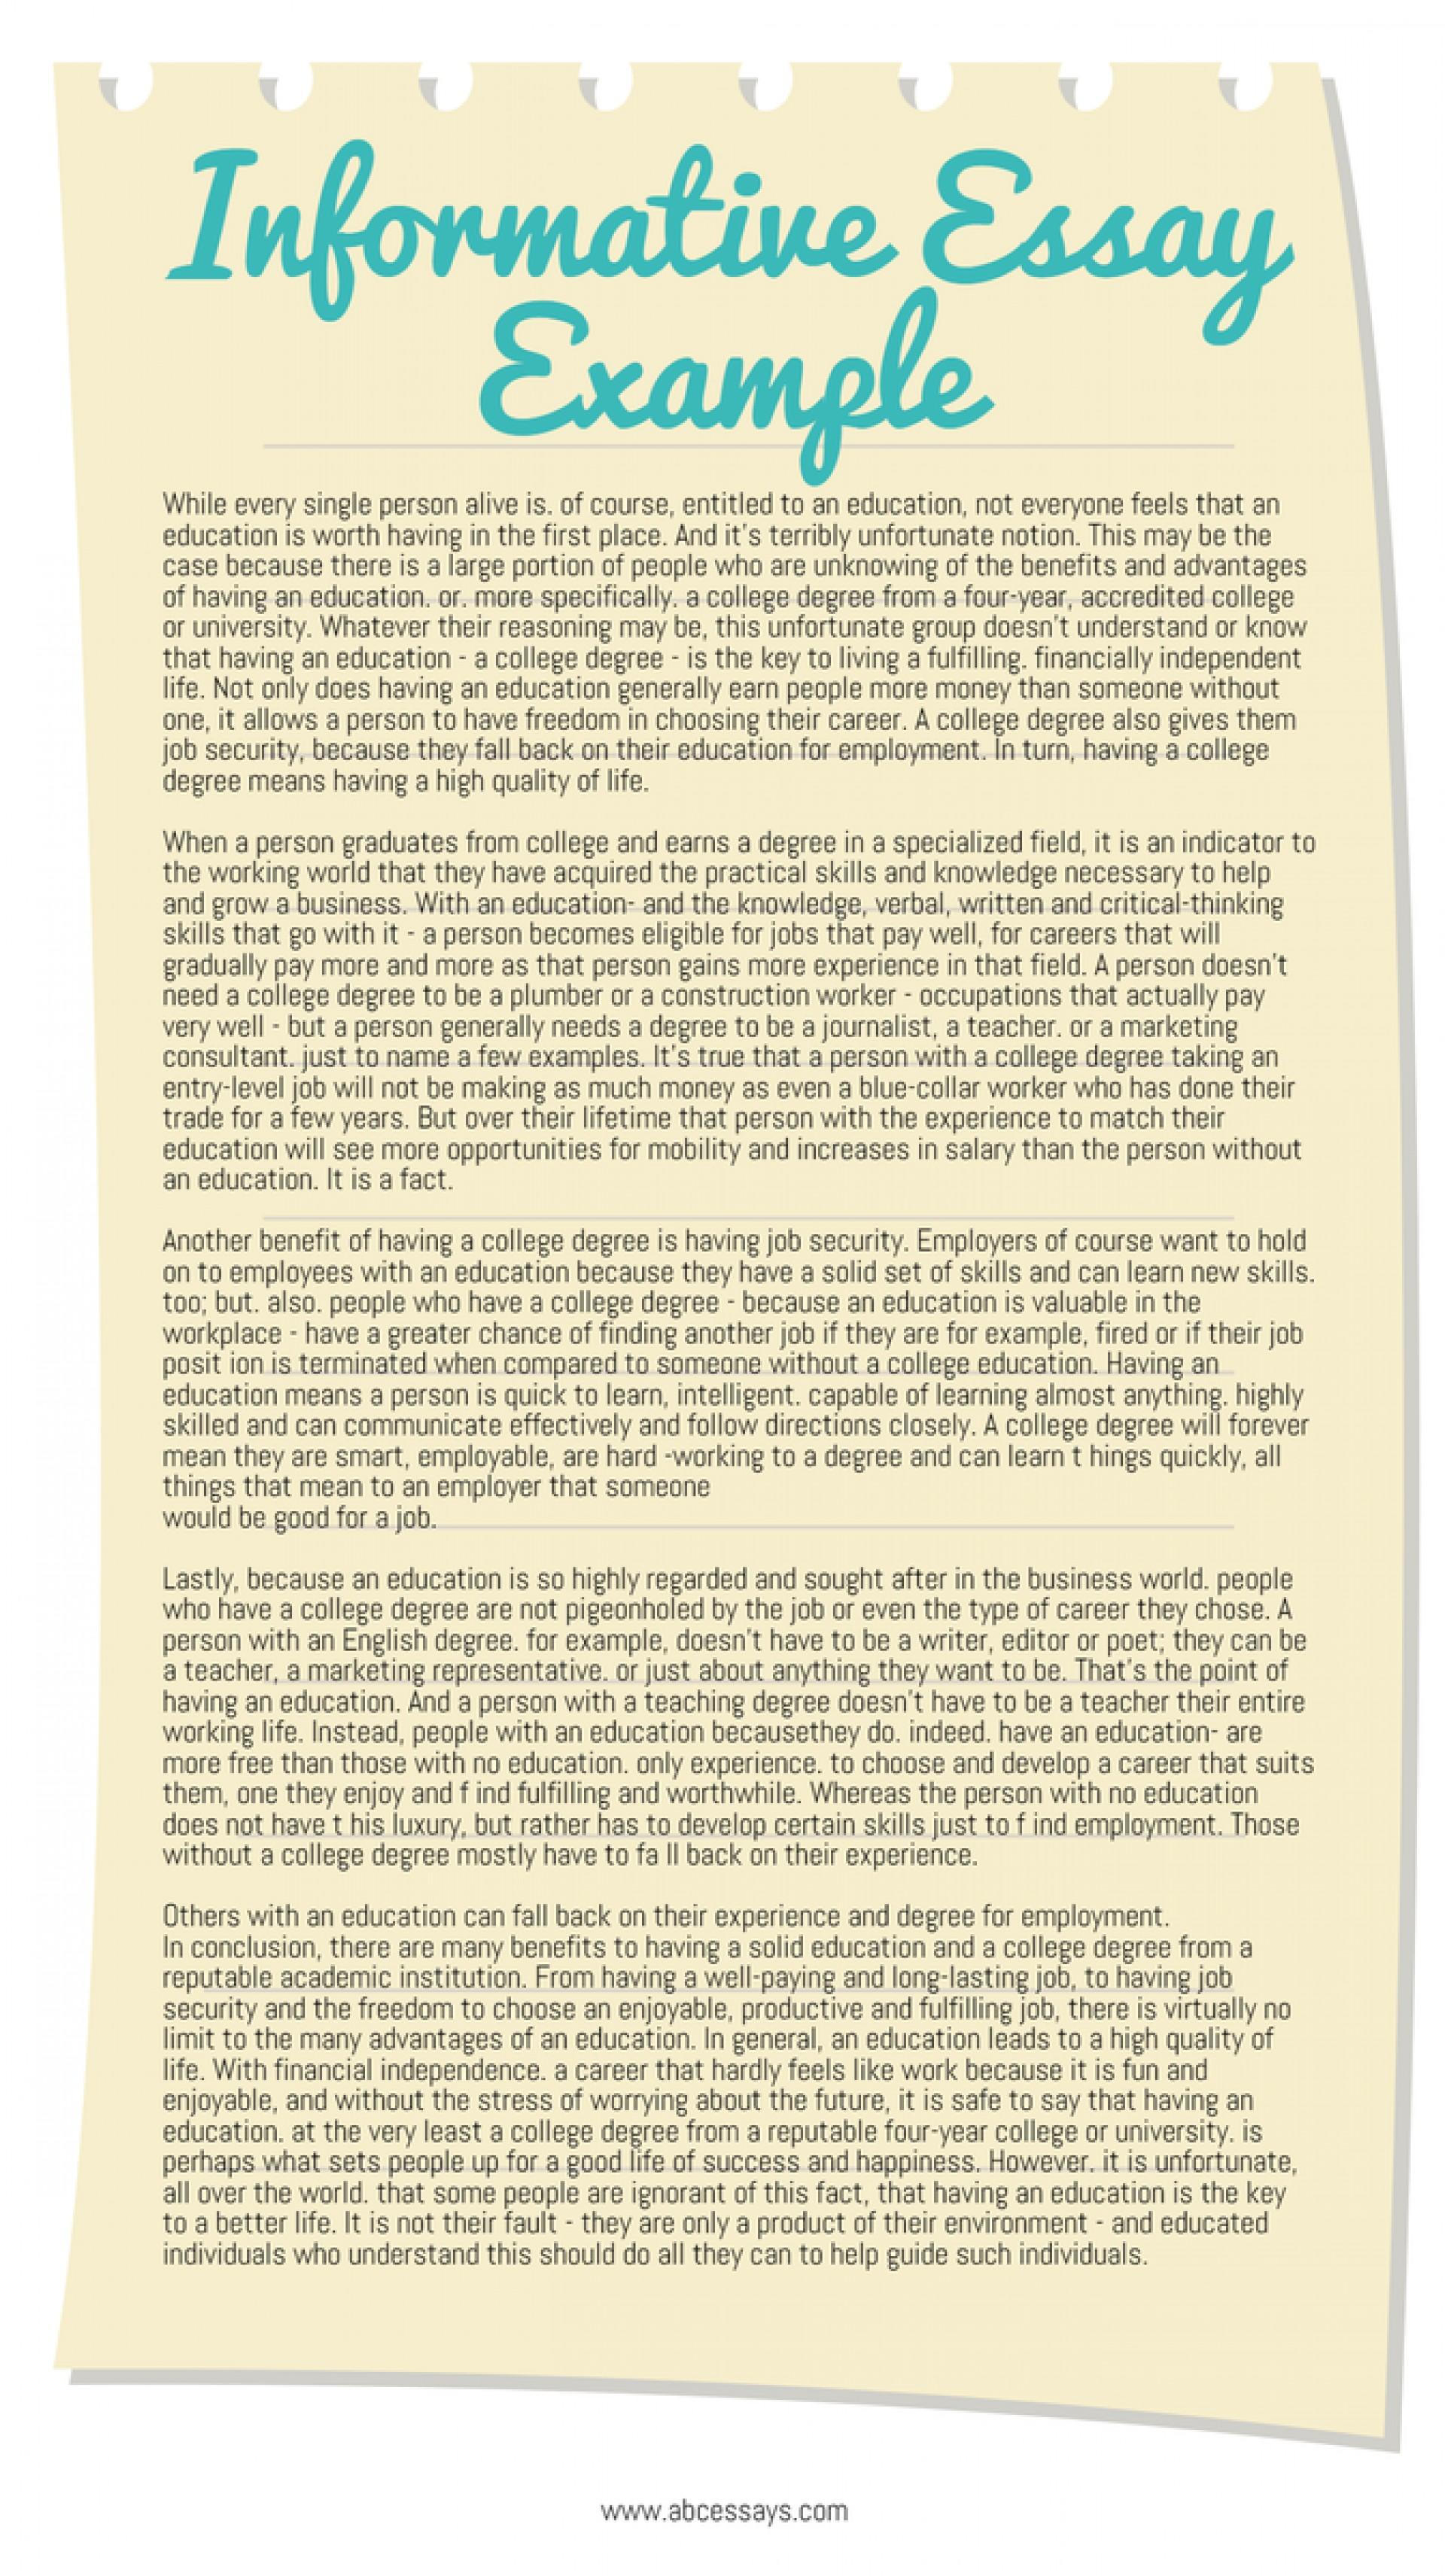 010 Cj8yymmwsaaz6h5 Informative Essay Impressive Example Examples College For High School Pdf 1920